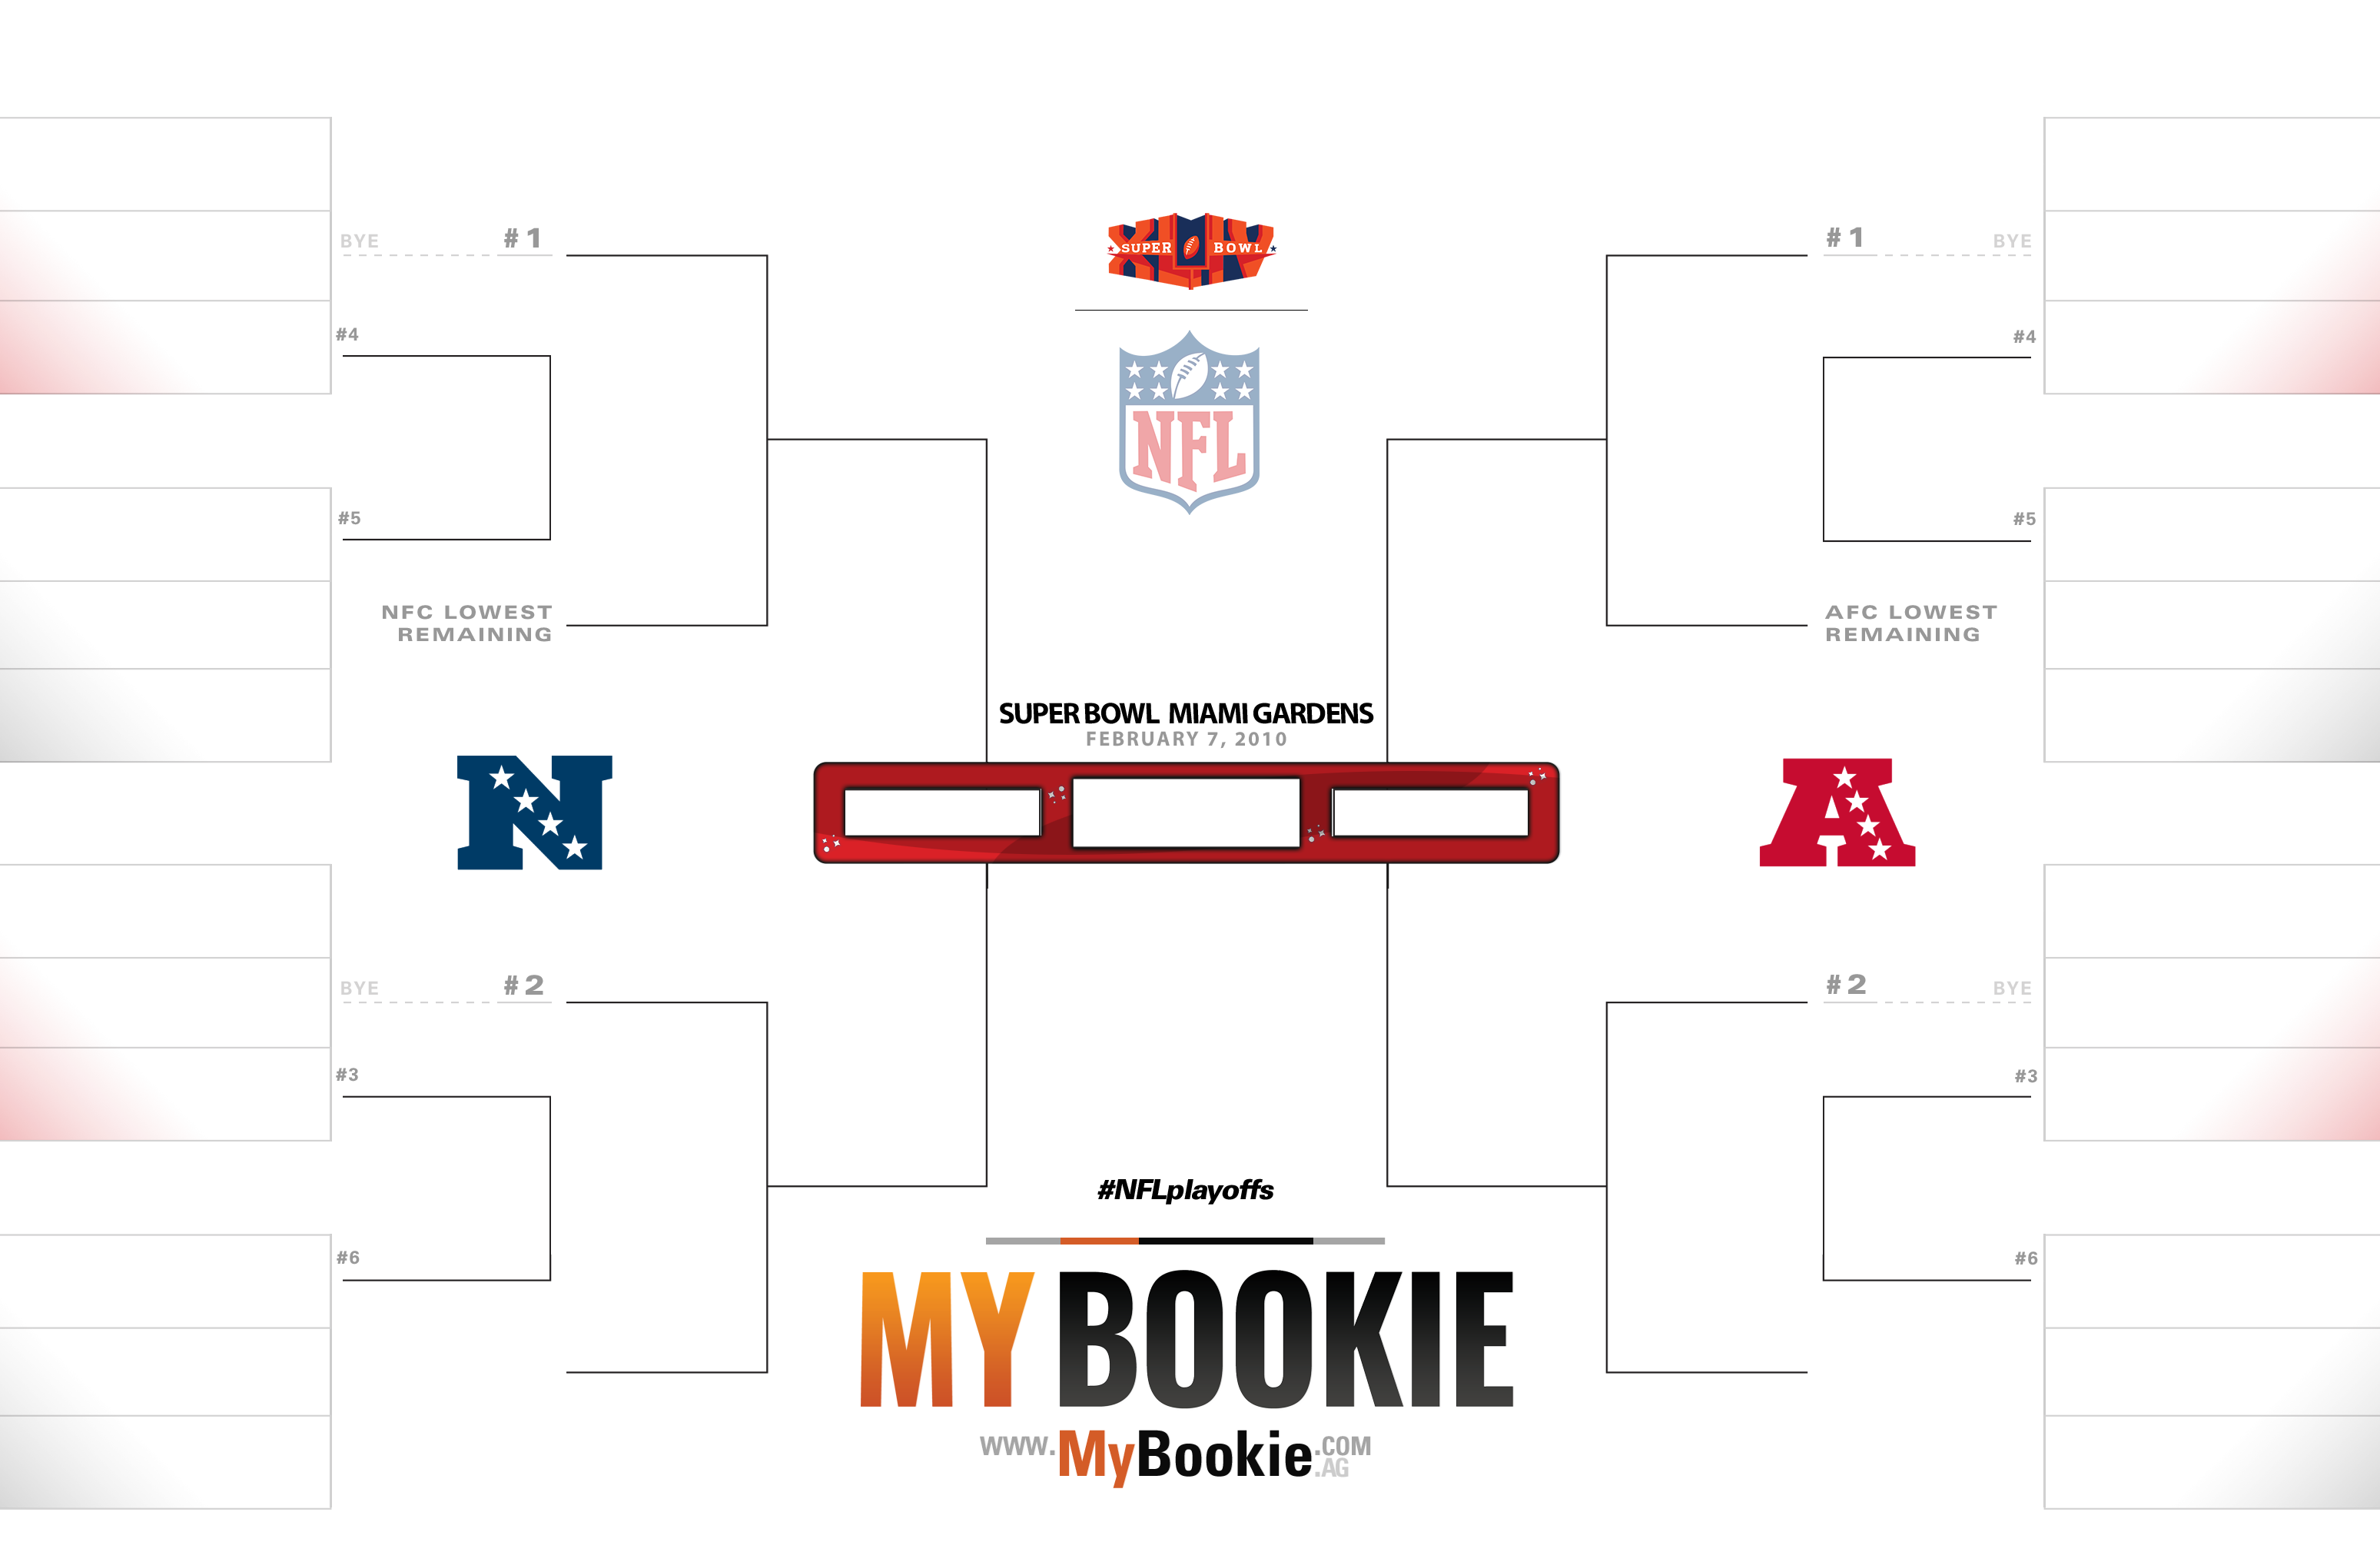 NFL Playoffs / Superbowl 2010 Printable Bracket